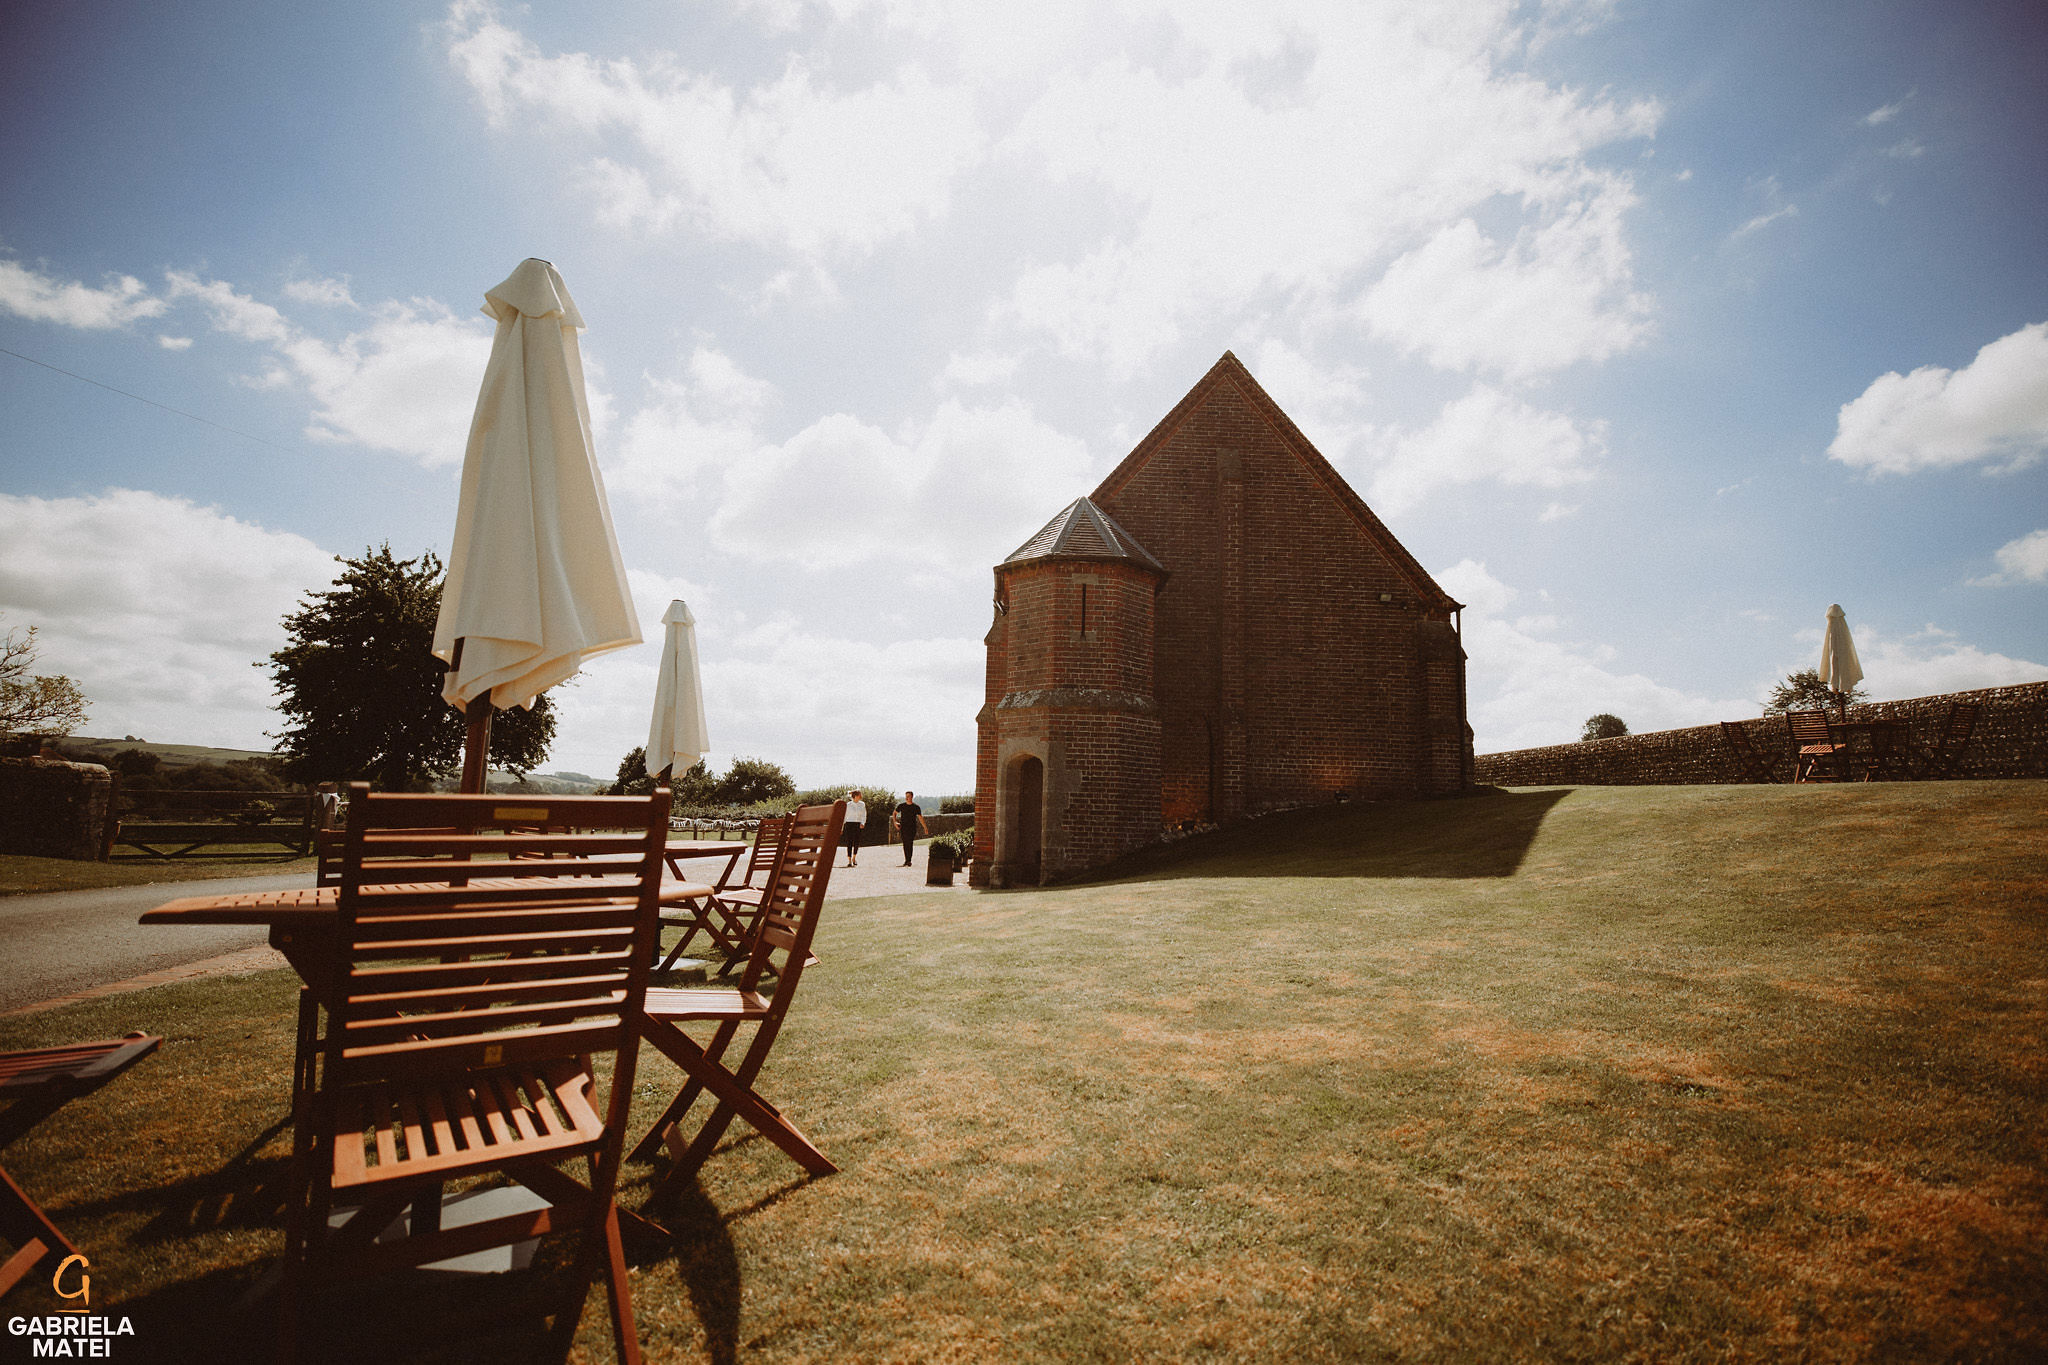 south stoke barn wedding photography by gabriela matei